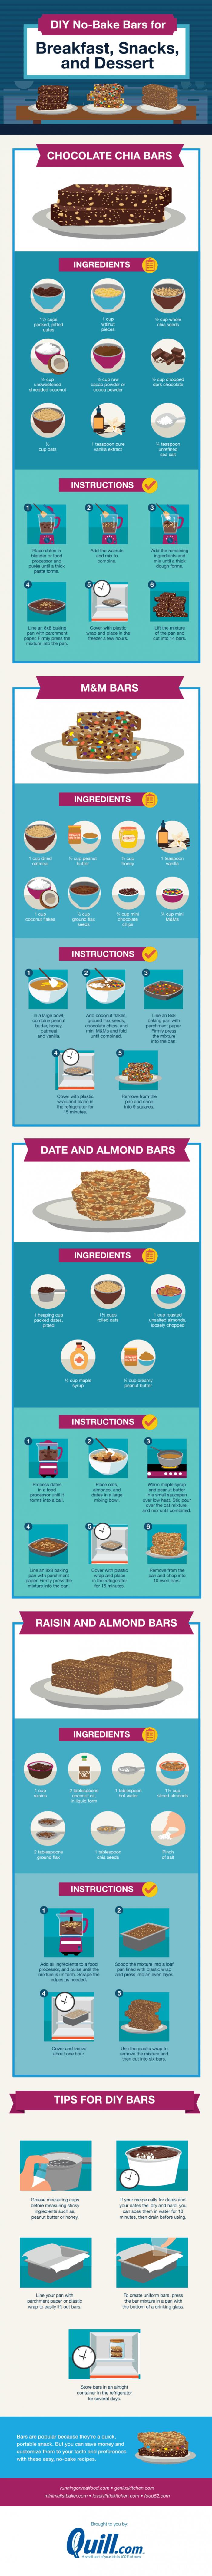 DIY No Bake Breakfast bars are easy